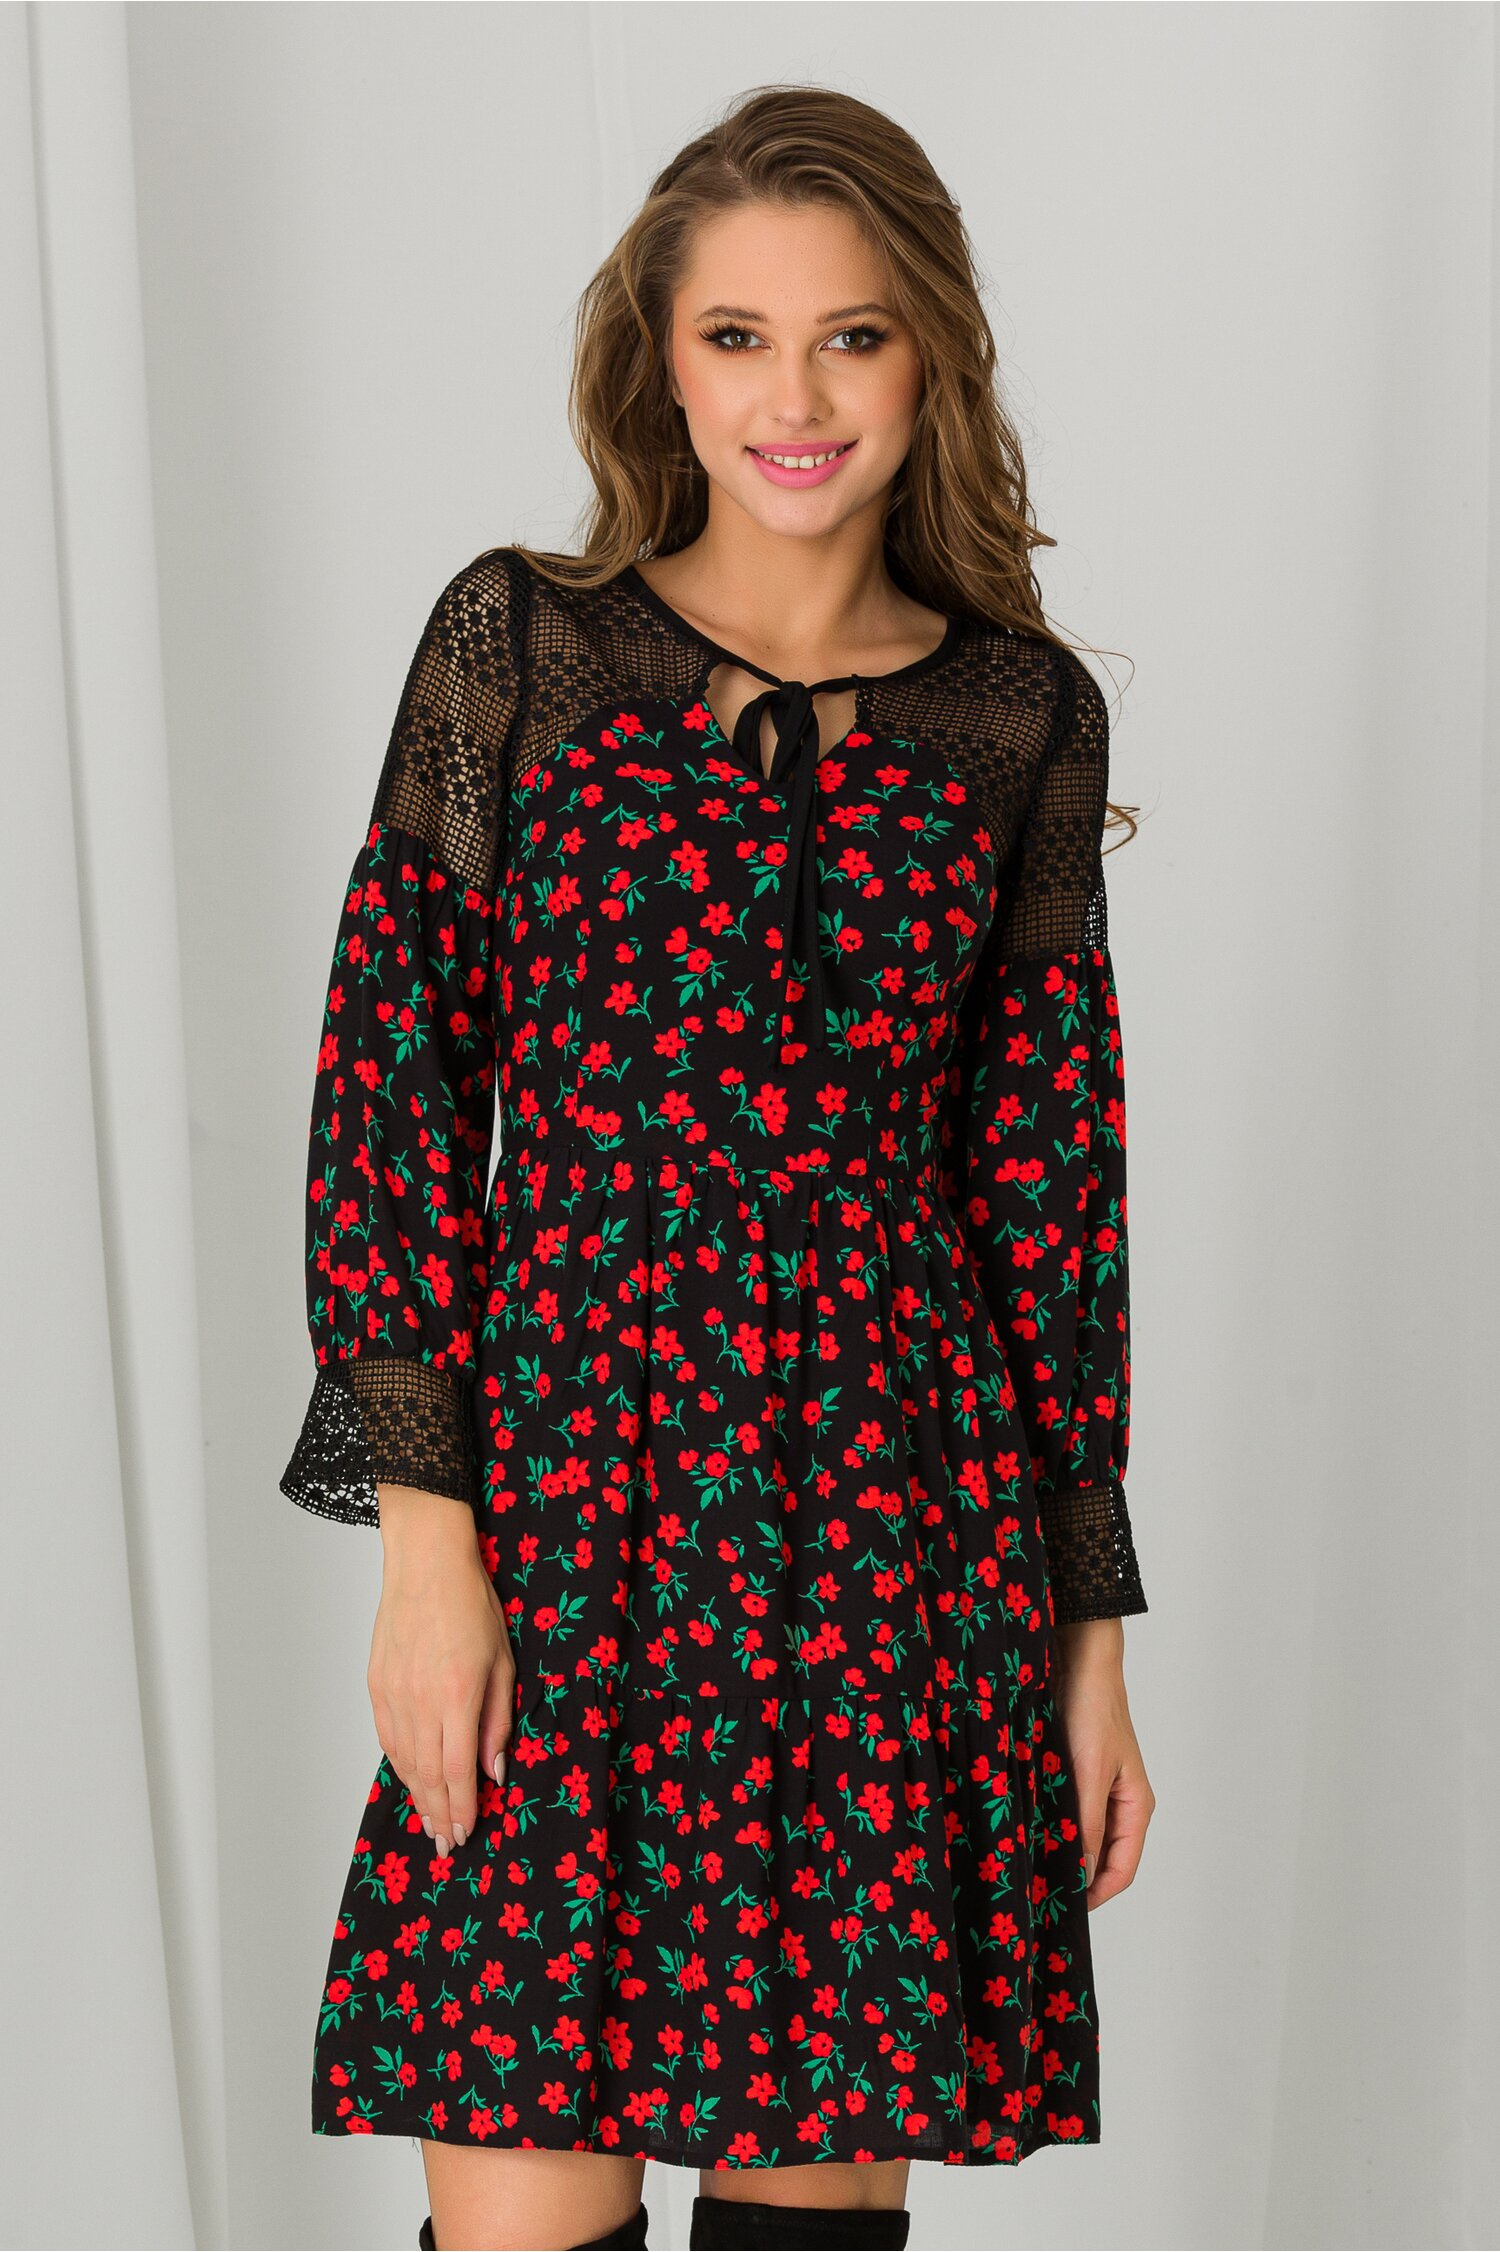 Rochie Moze neagra cu imprimeuri florale rosii si dantela la decolteu imagine dyfashion.ro 2021